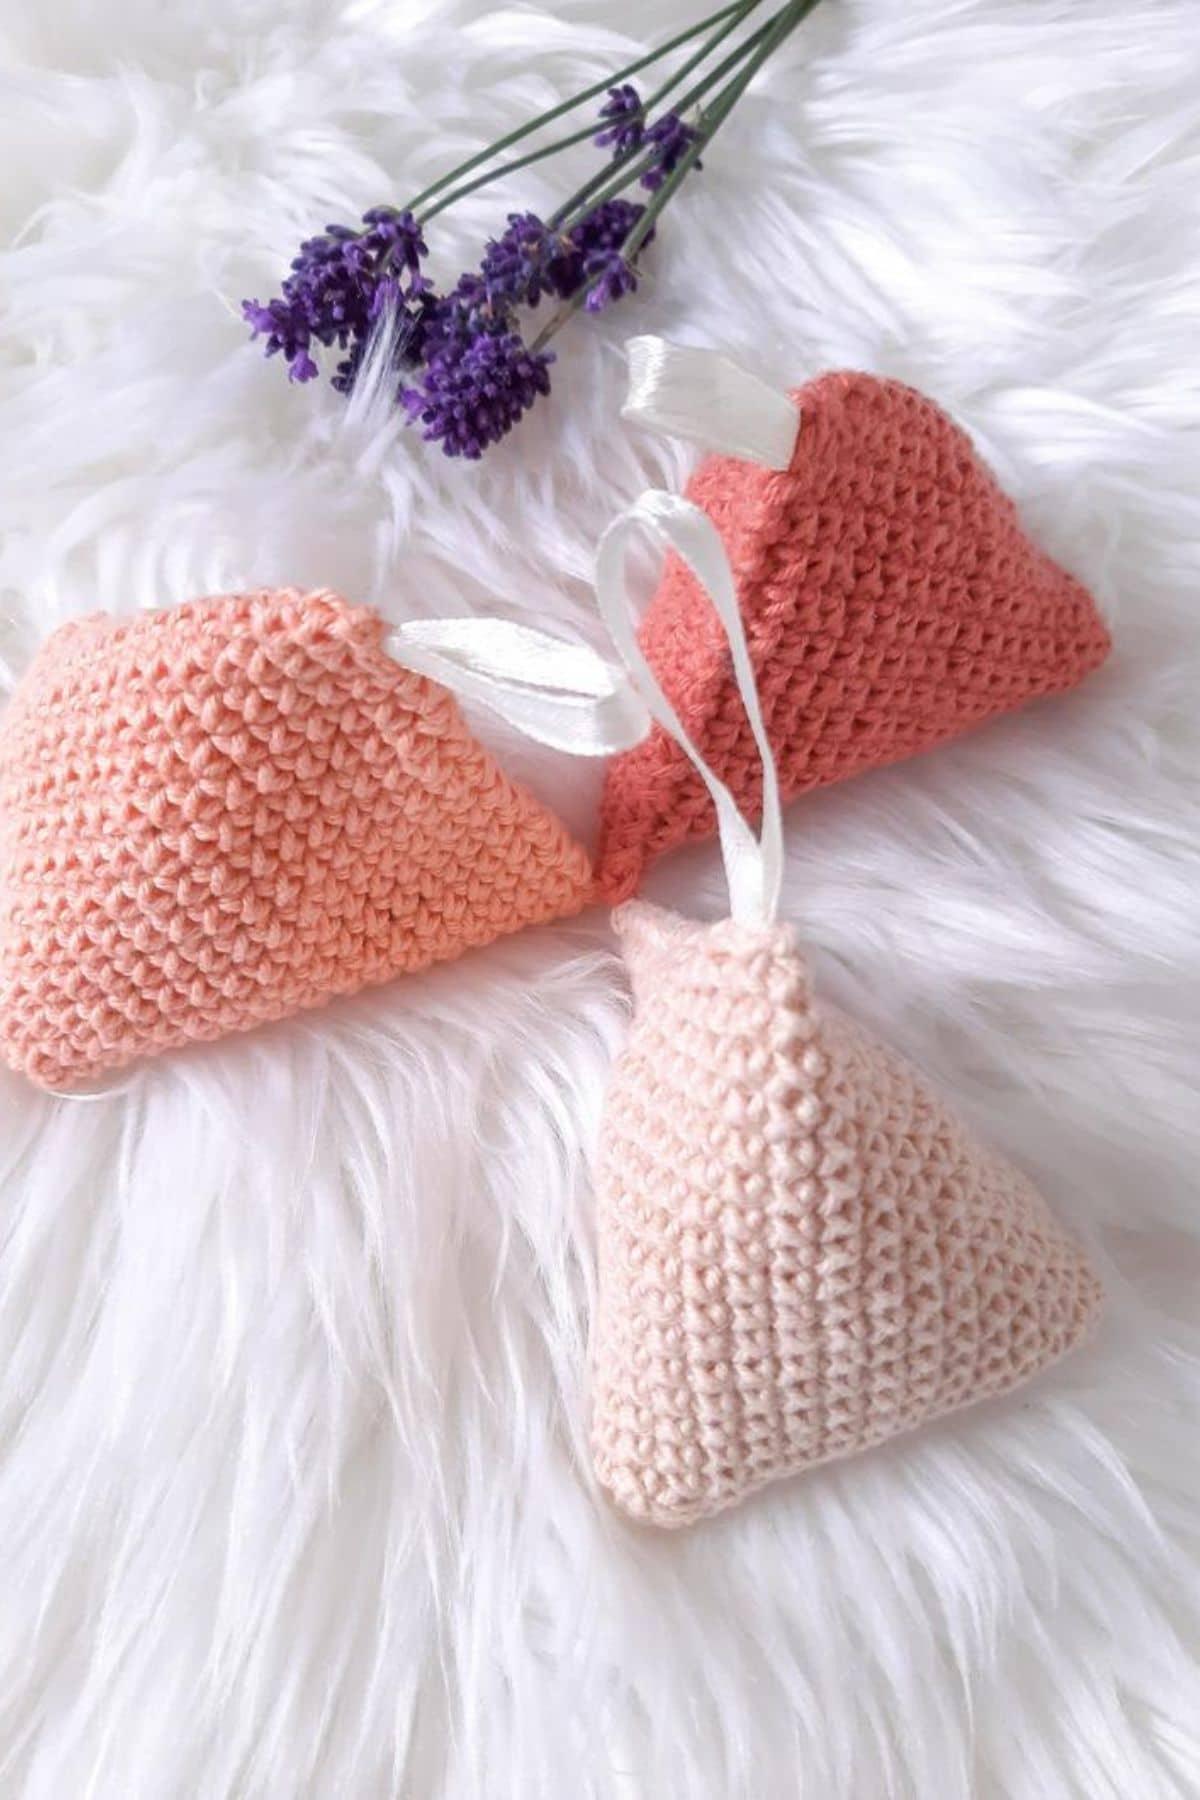 Crochet sachets